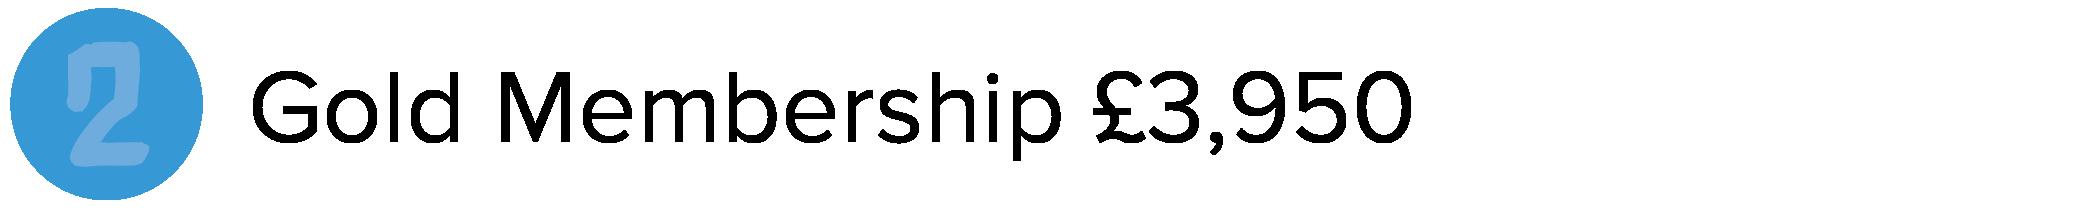 Gold Membership £3,950